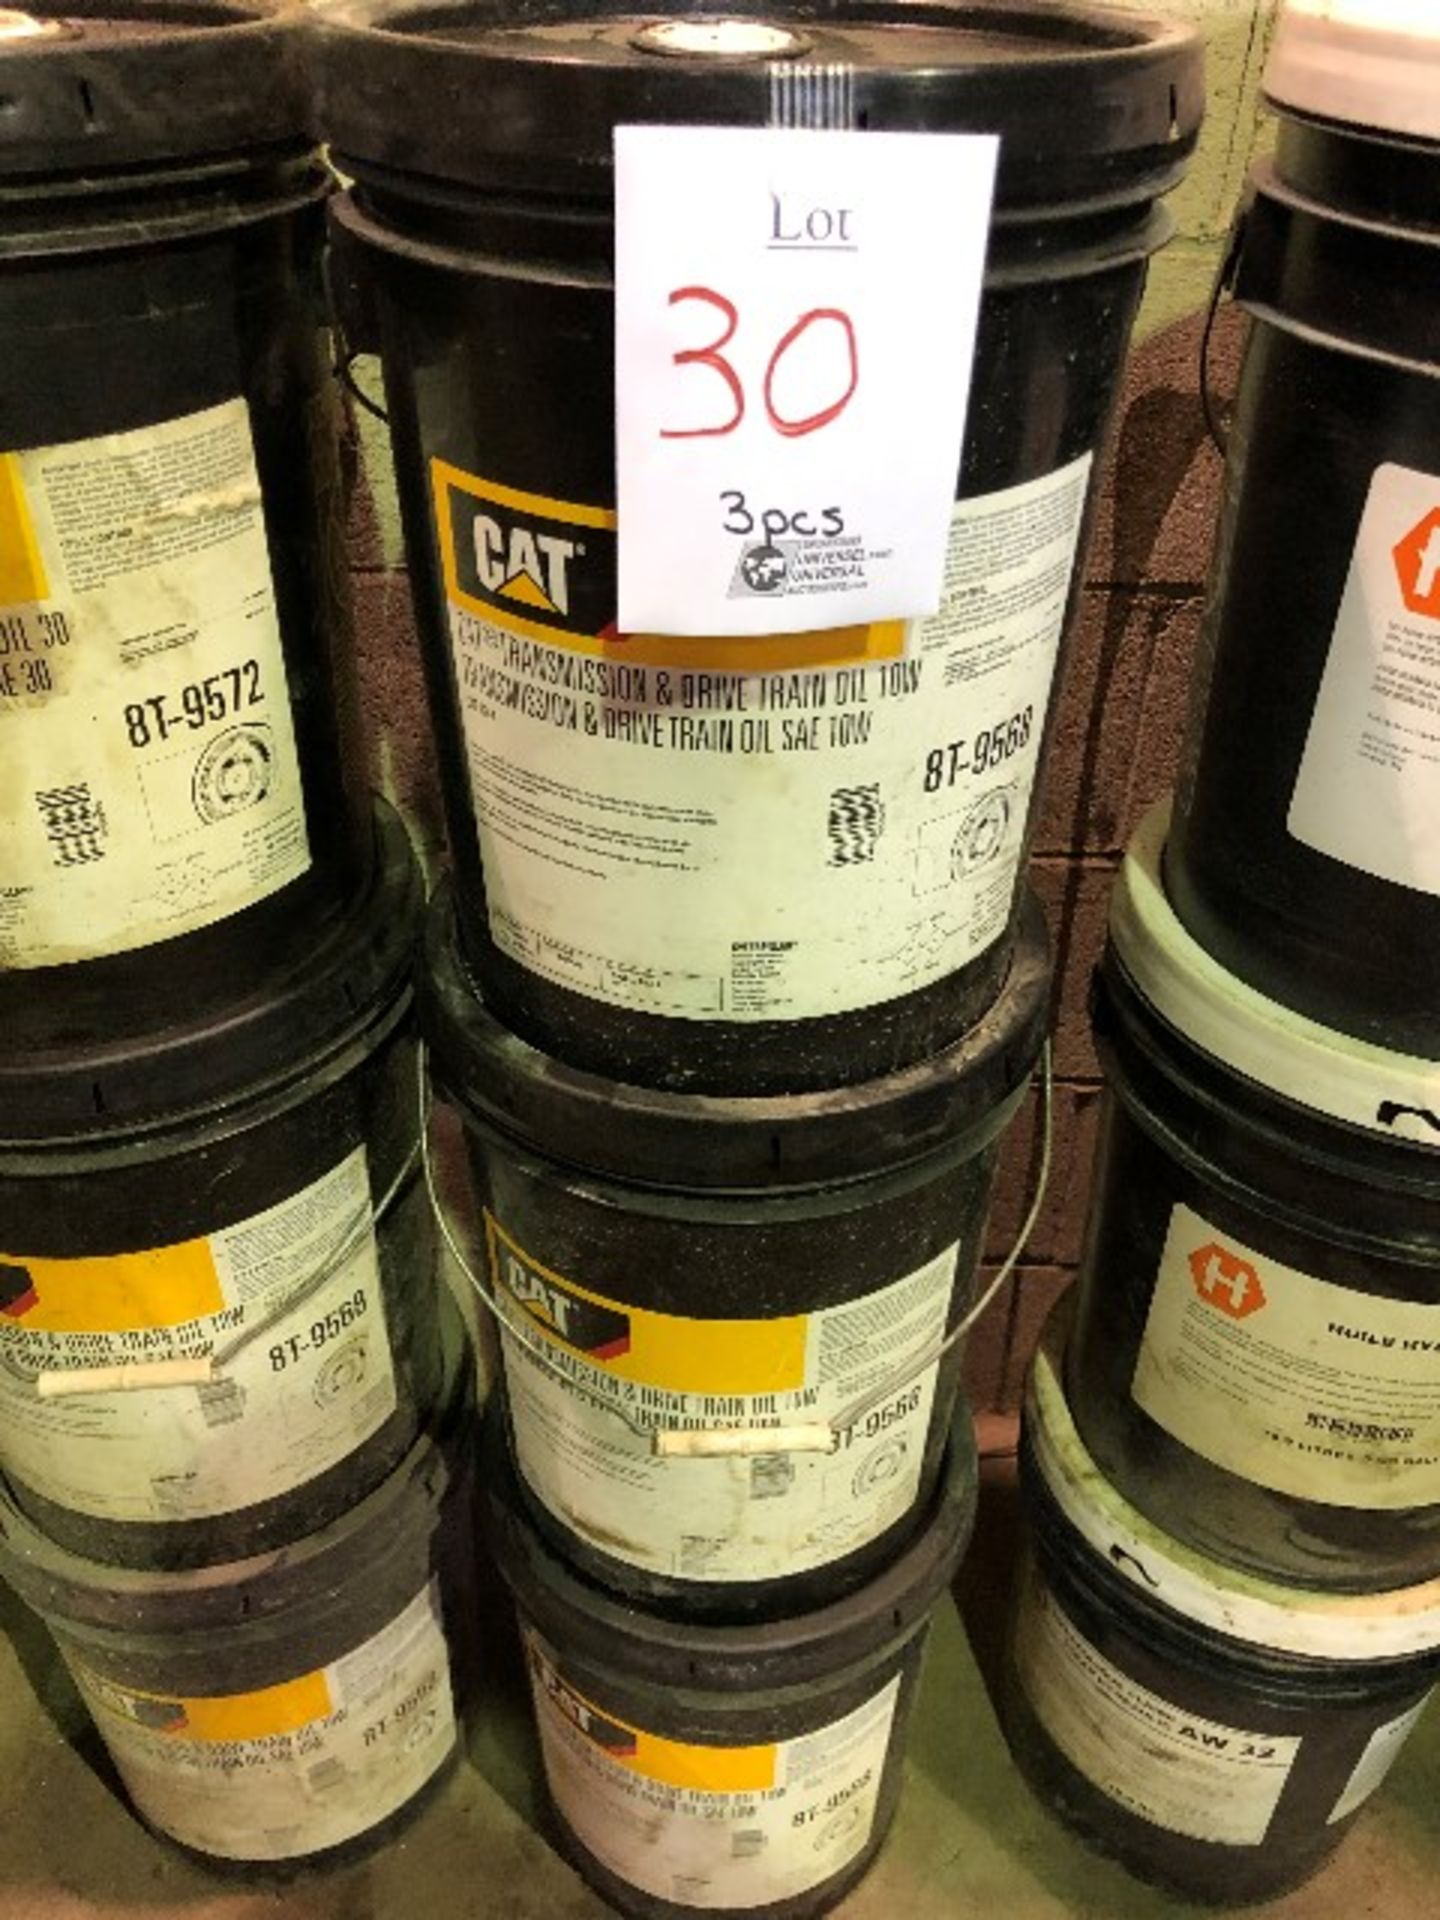 CAT Transmission & drive train oil, SAE 10W, 3 pails